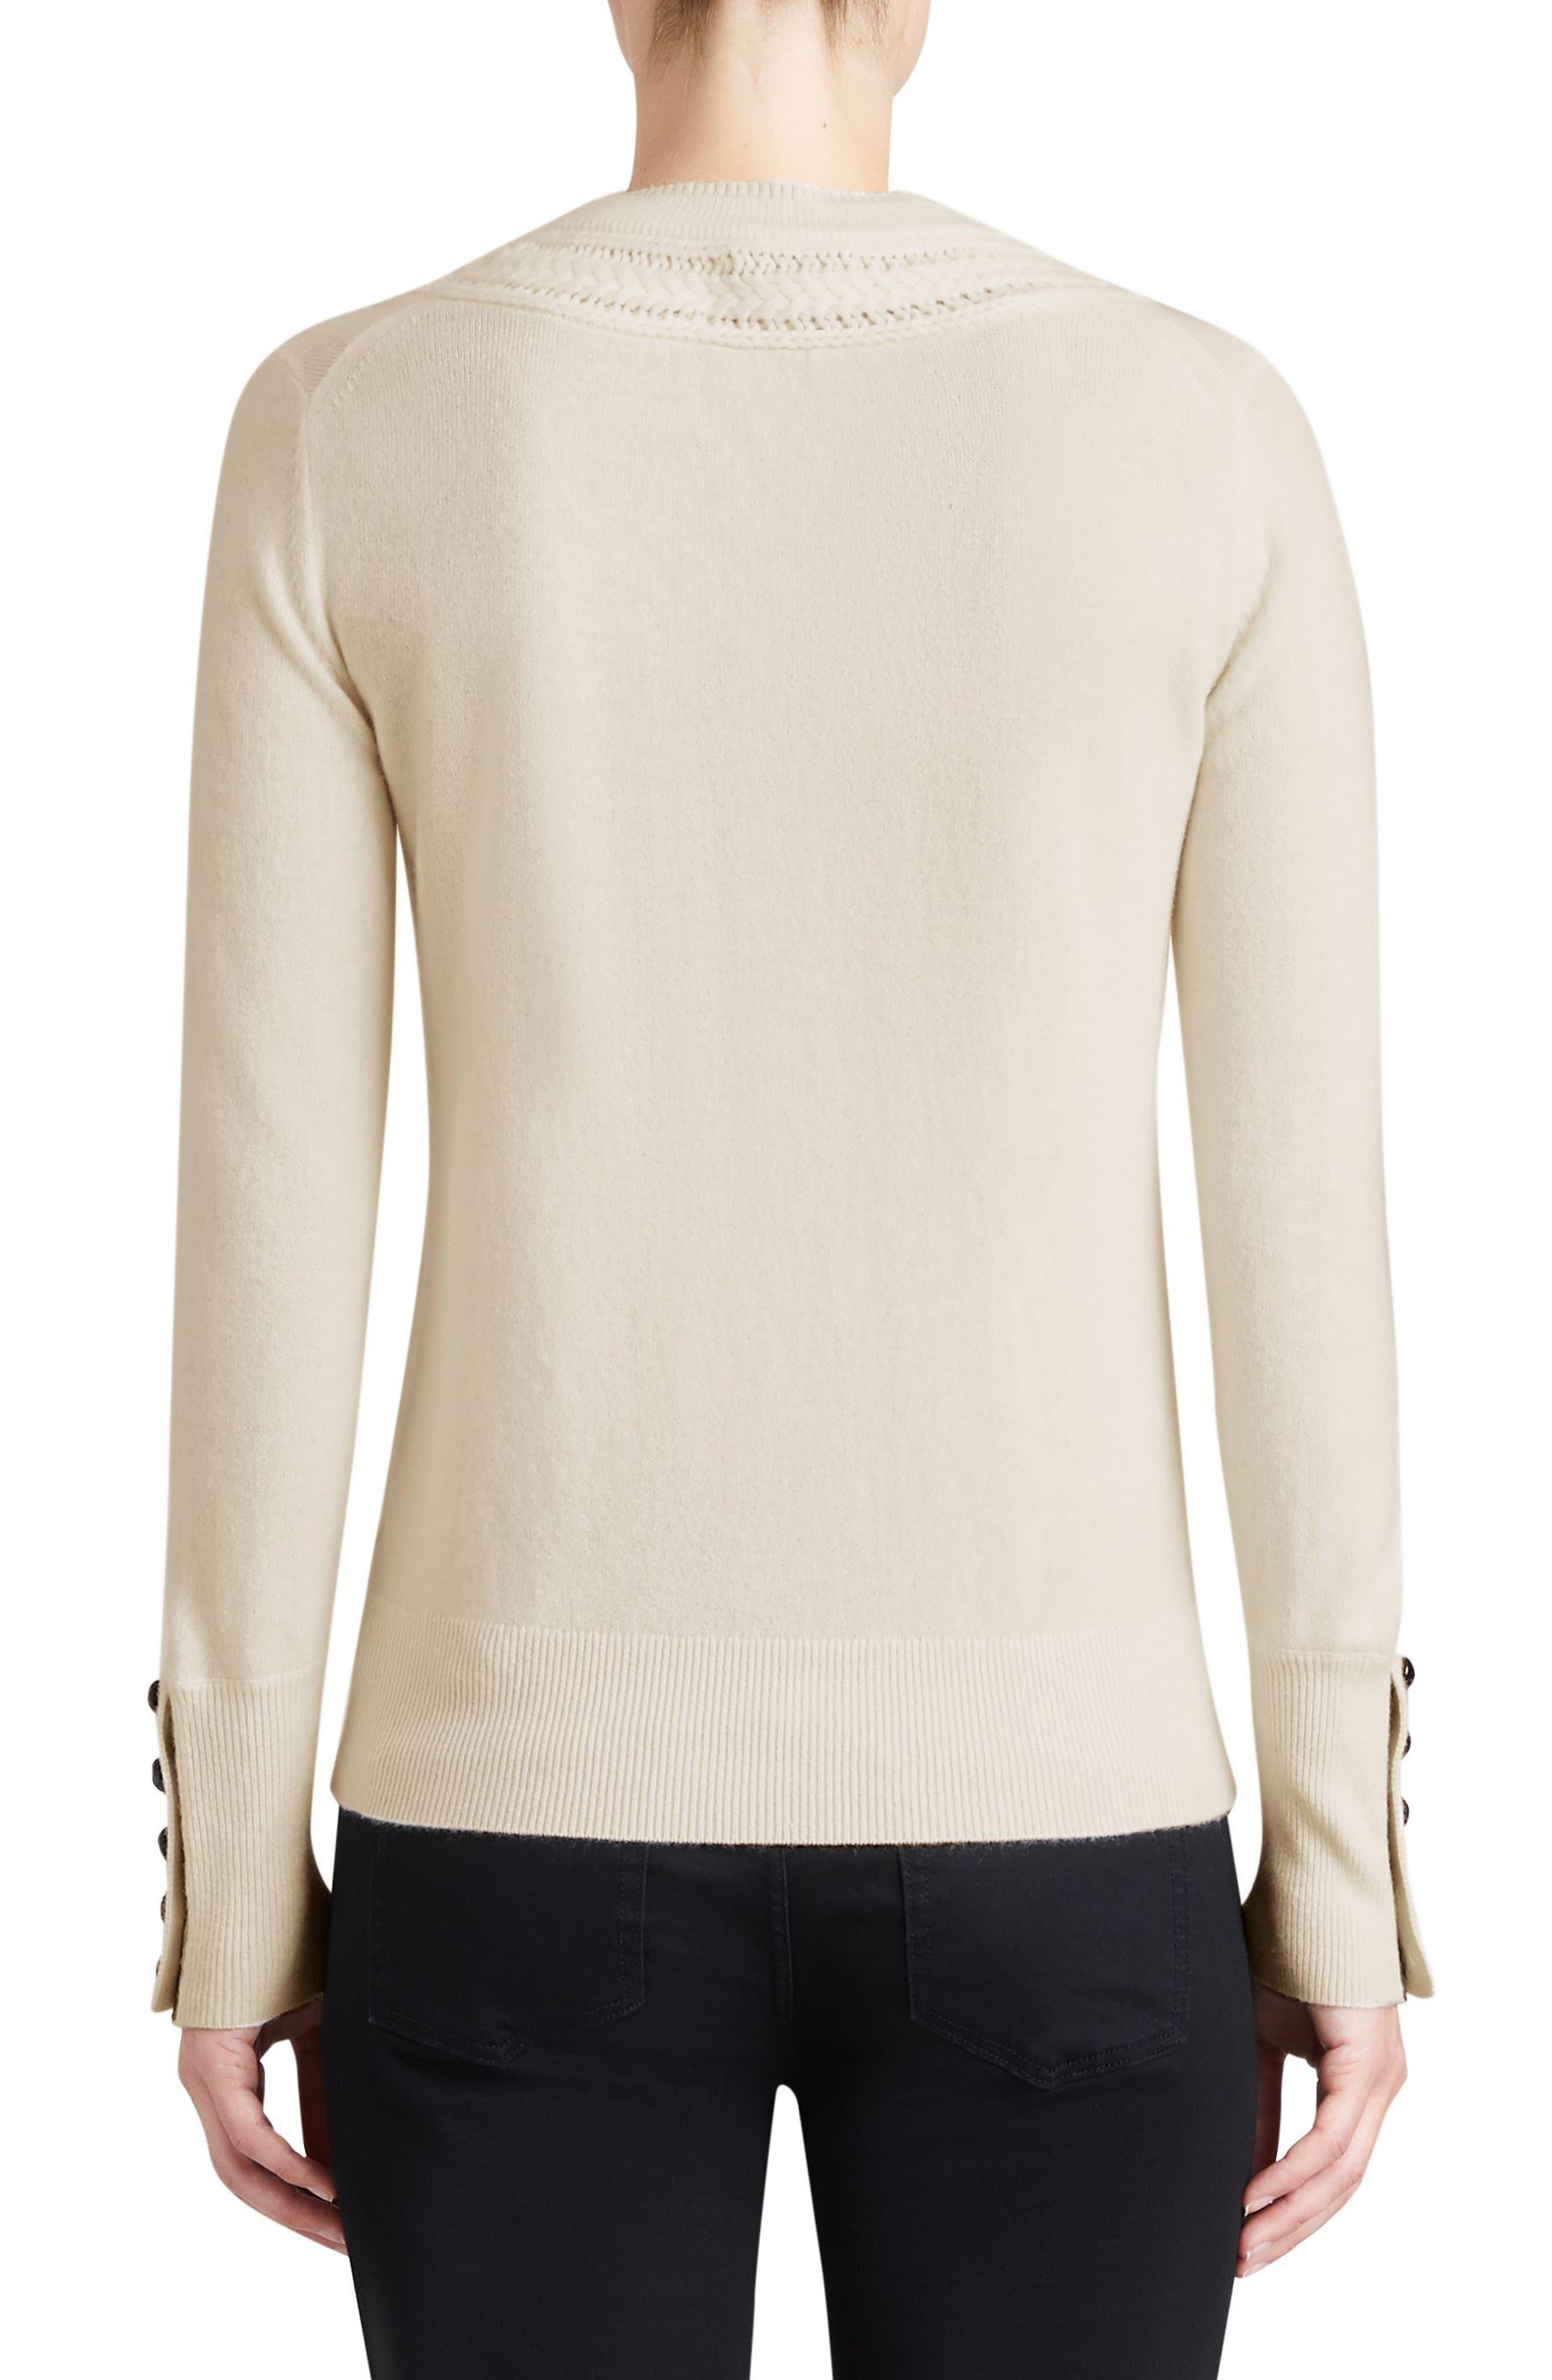 Carapelle Cashmere Sweater,                             Alternate thumbnail 5, color,